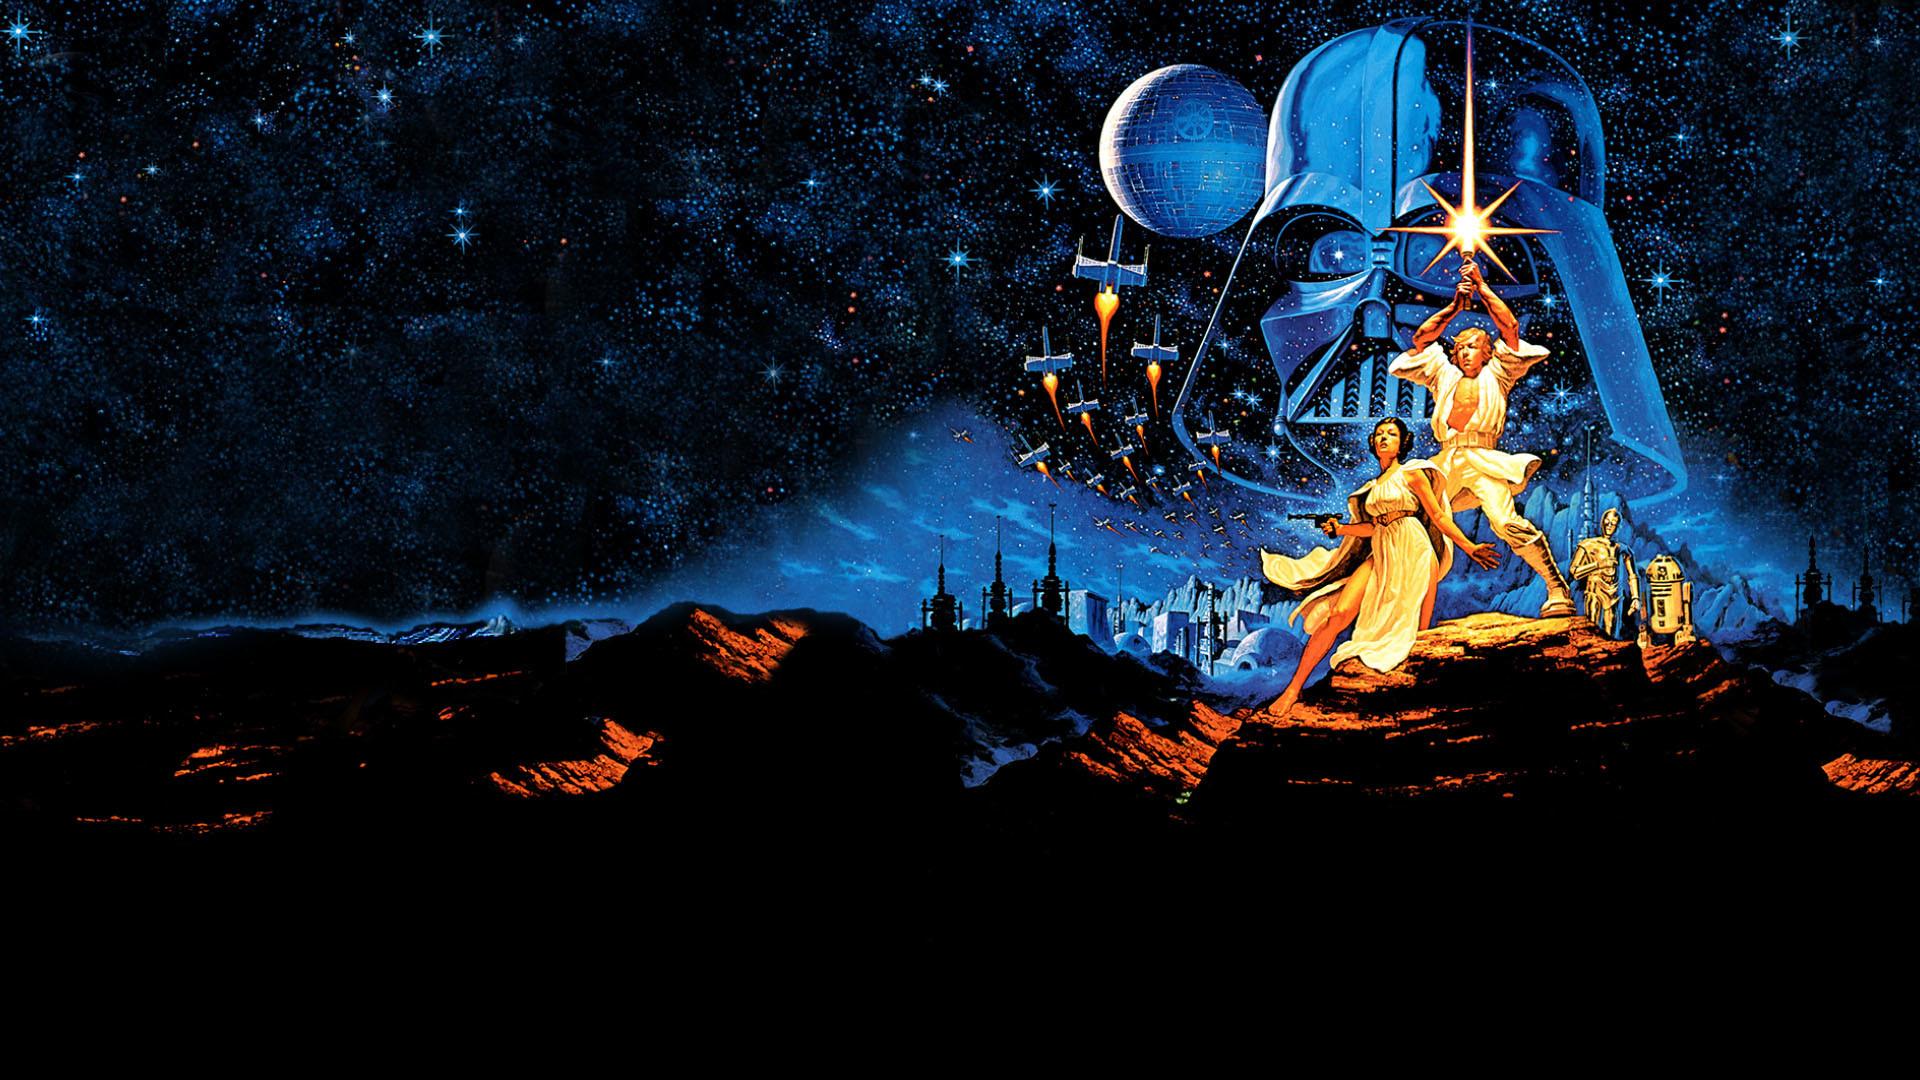 55 Stars Wars Wallpaper On Wallpapersafari